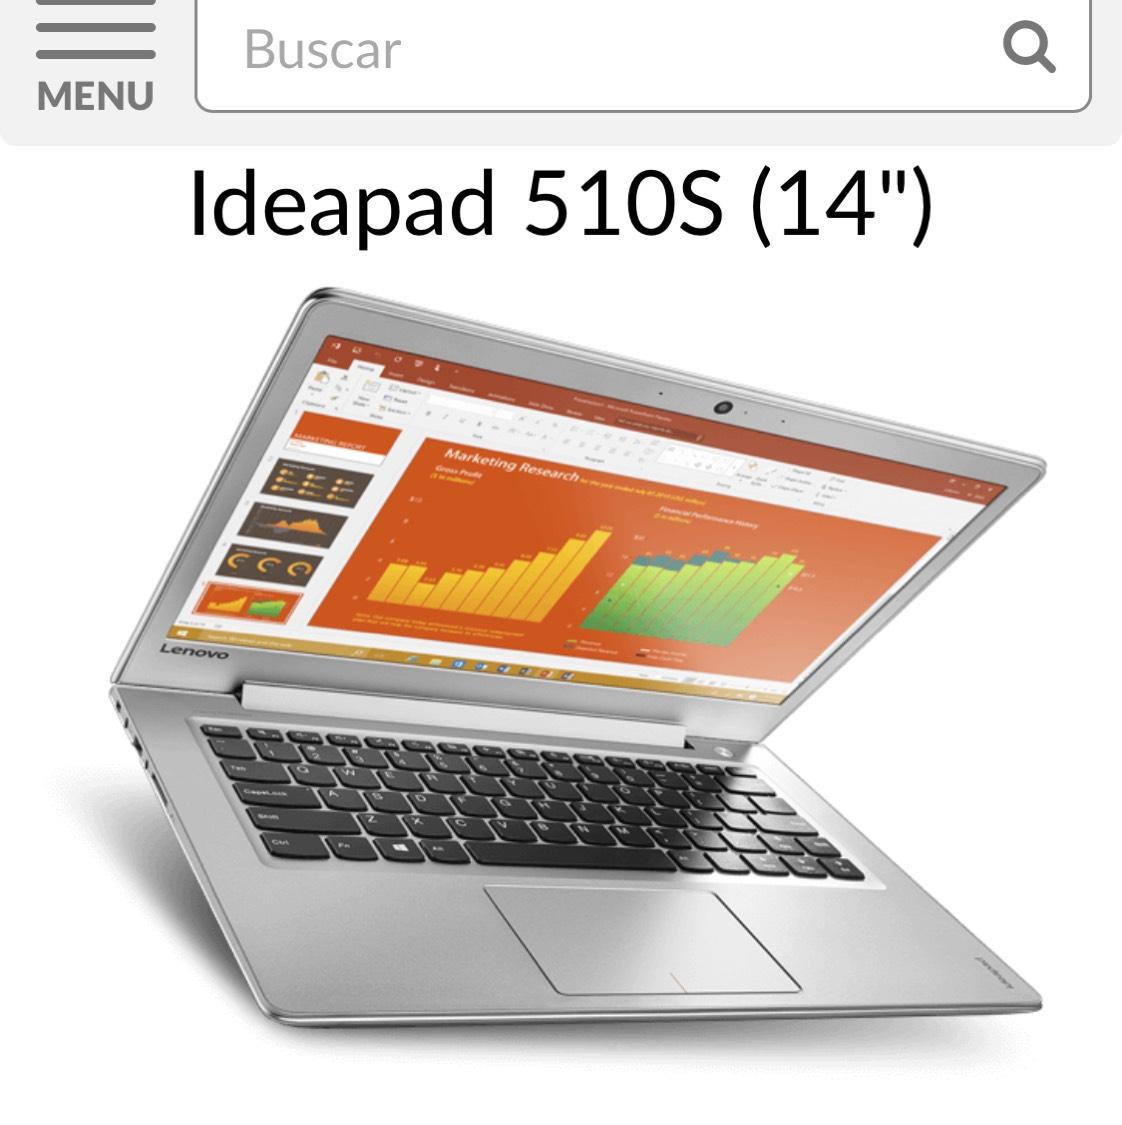 Tienda Telmex: Laptop Lenovo 510S Core i7, 8GB RAM, 1TB disco duro (precio a clientes Infinitum)